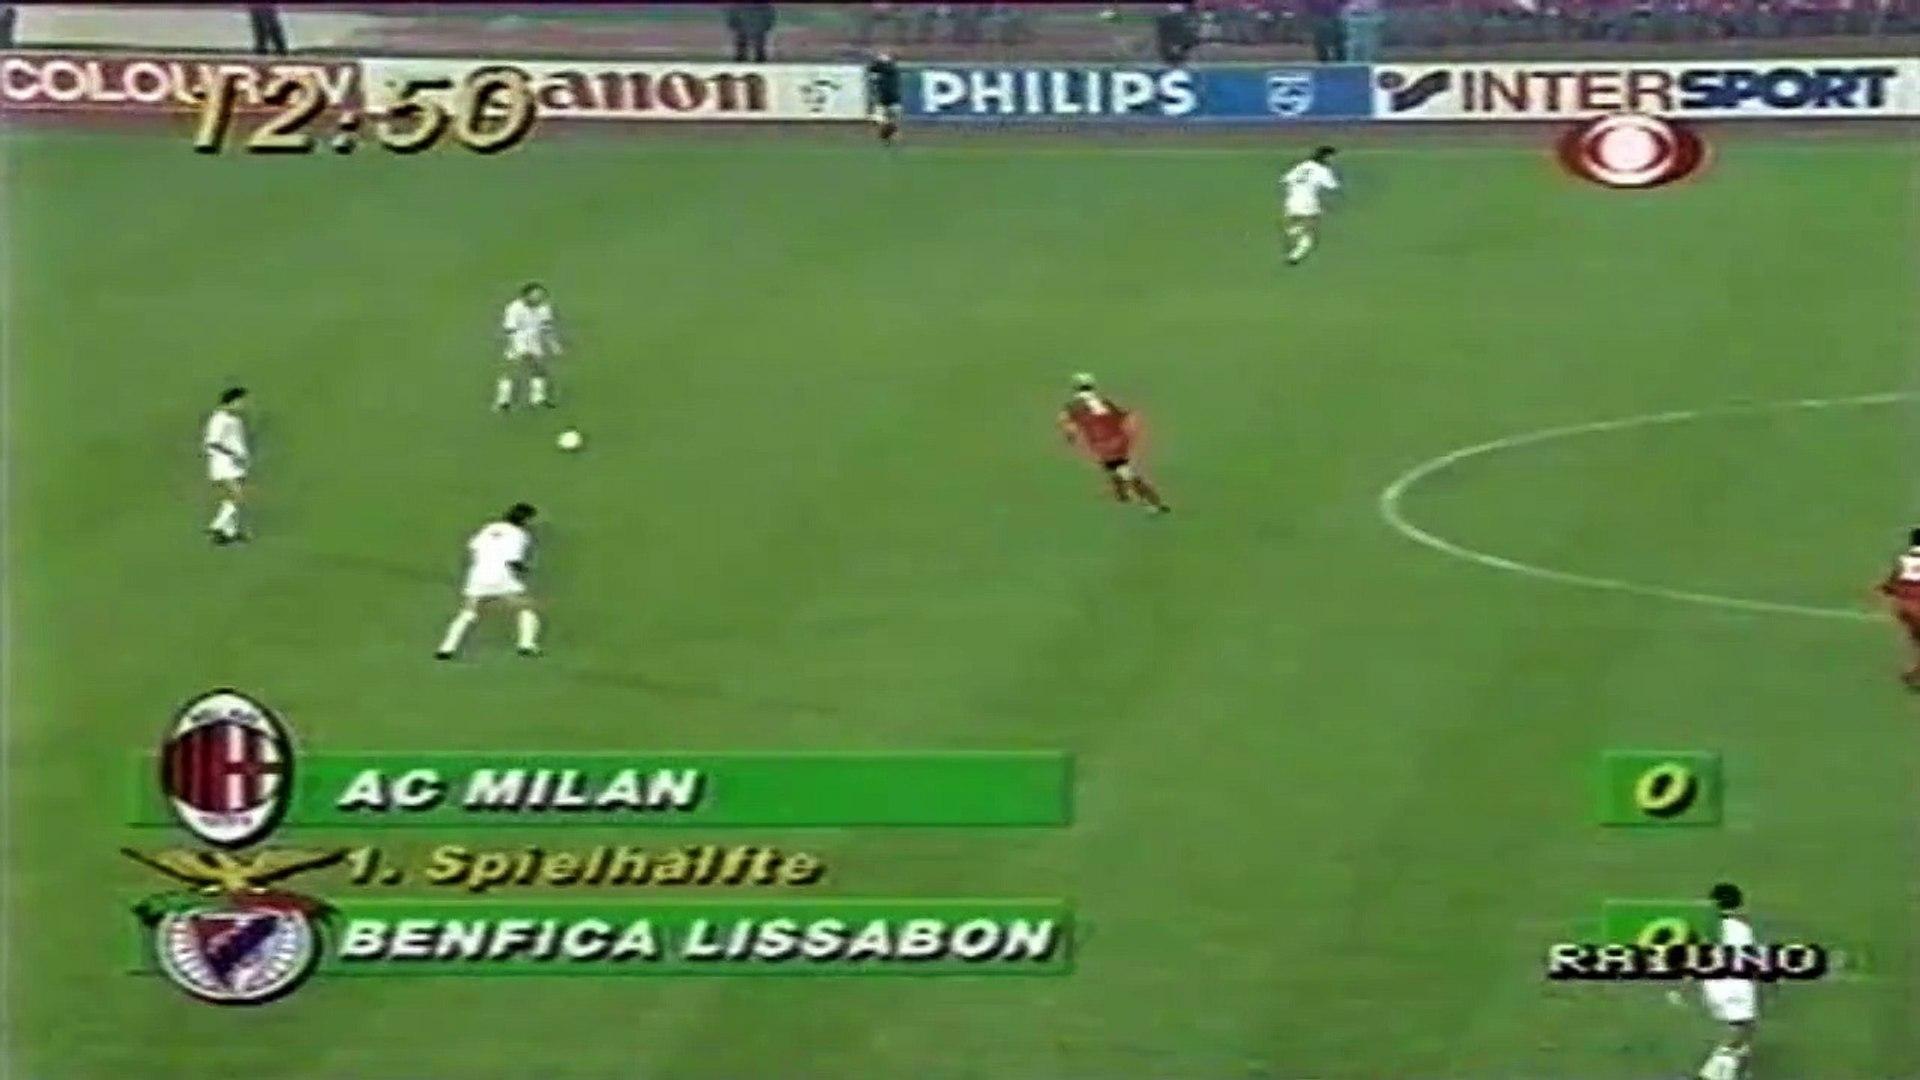 AC Milan 1:0 Benfica ● European Champion Clubs' Cup Final 1989-90 ● First Half